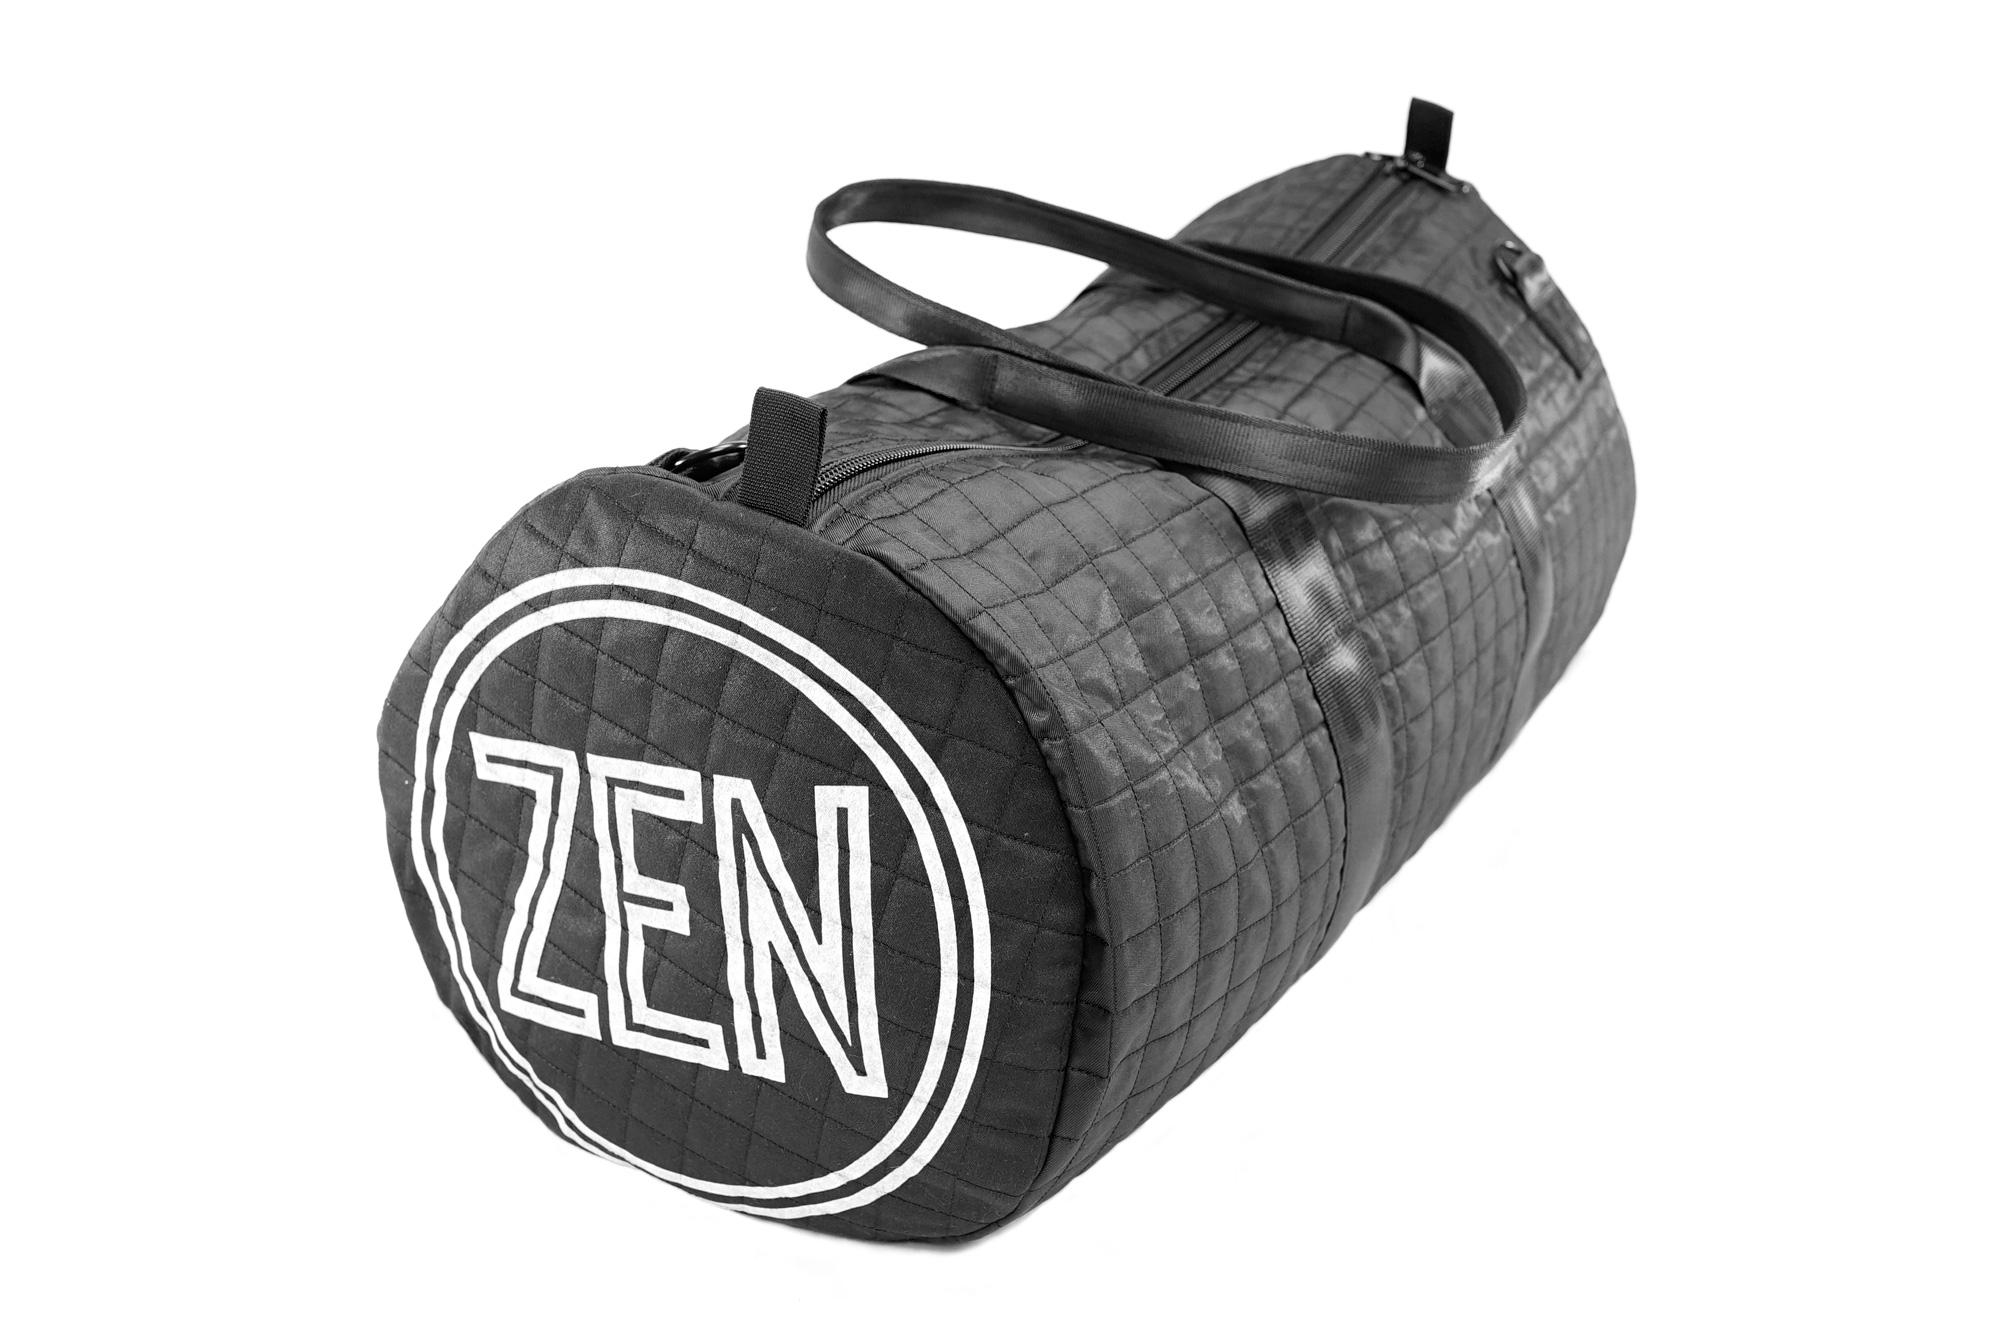 zen_garage_trackday_duffle_bag_madeinitaly_nomex_2